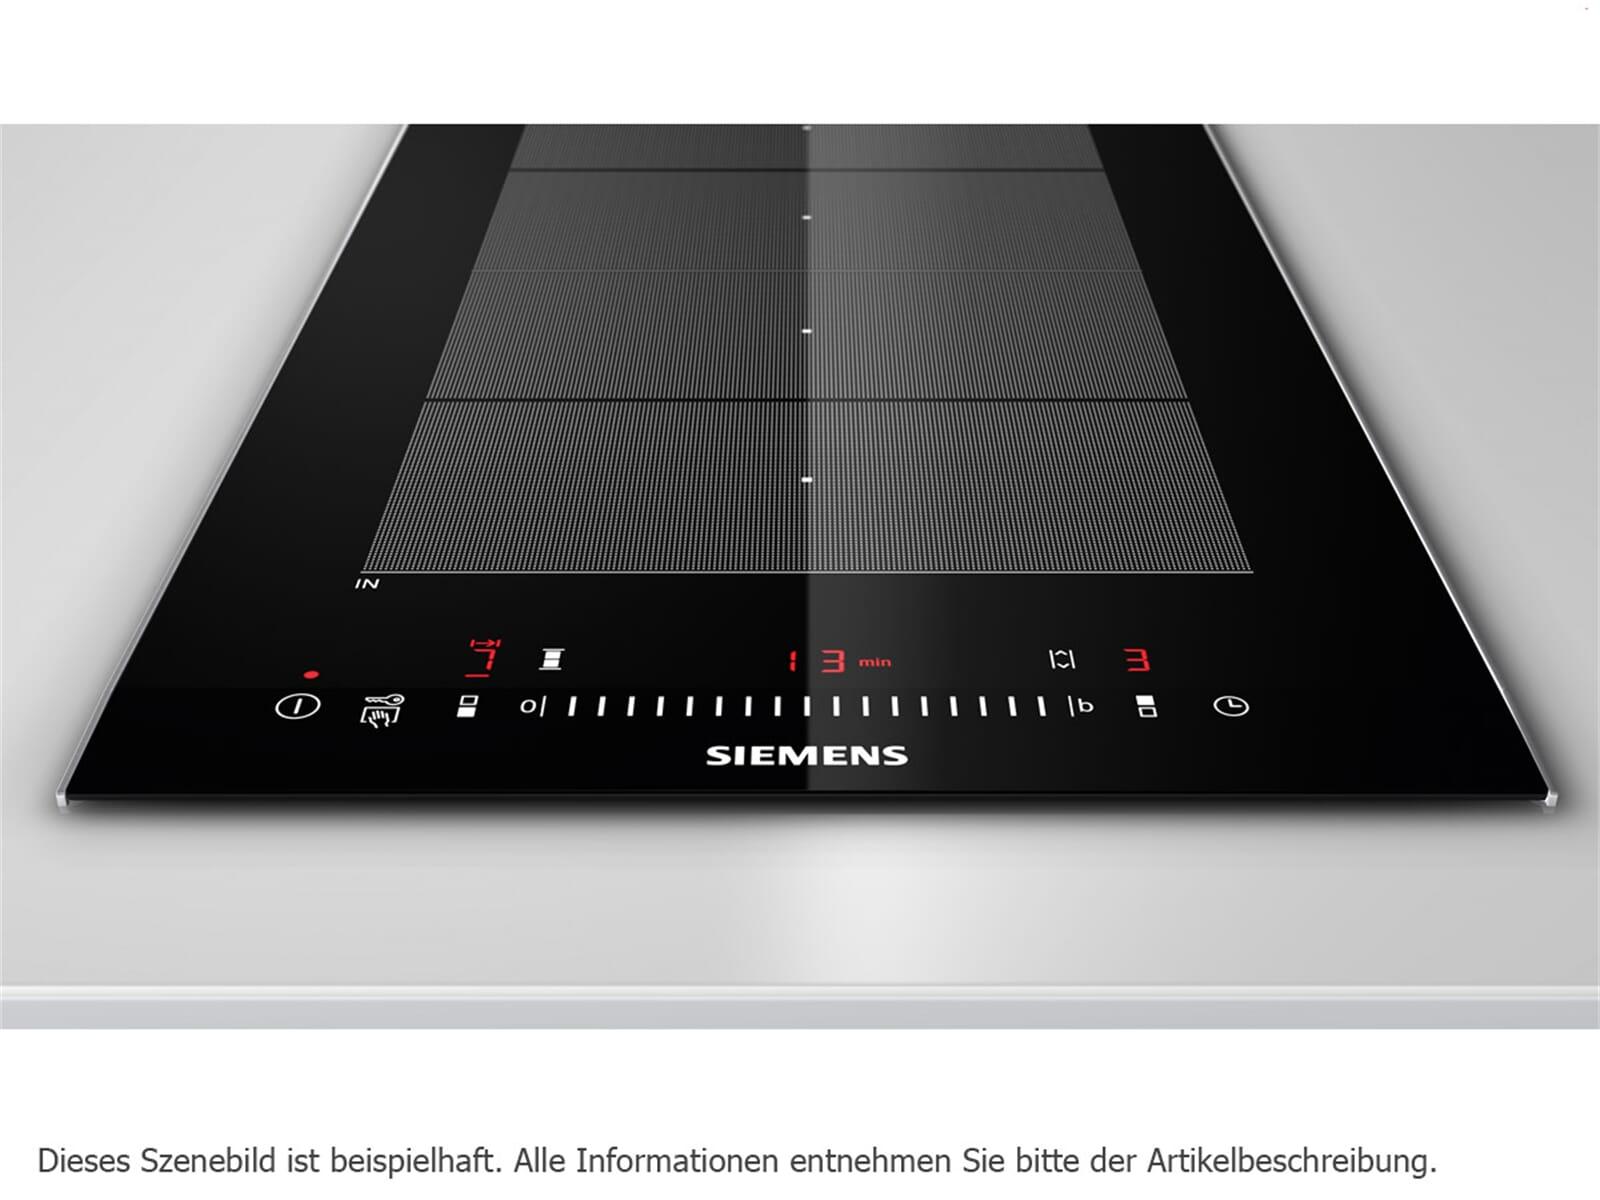 siemens ex375fxb1e domino induktionskochfeld autark. Black Bedroom Furniture Sets. Home Design Ideas